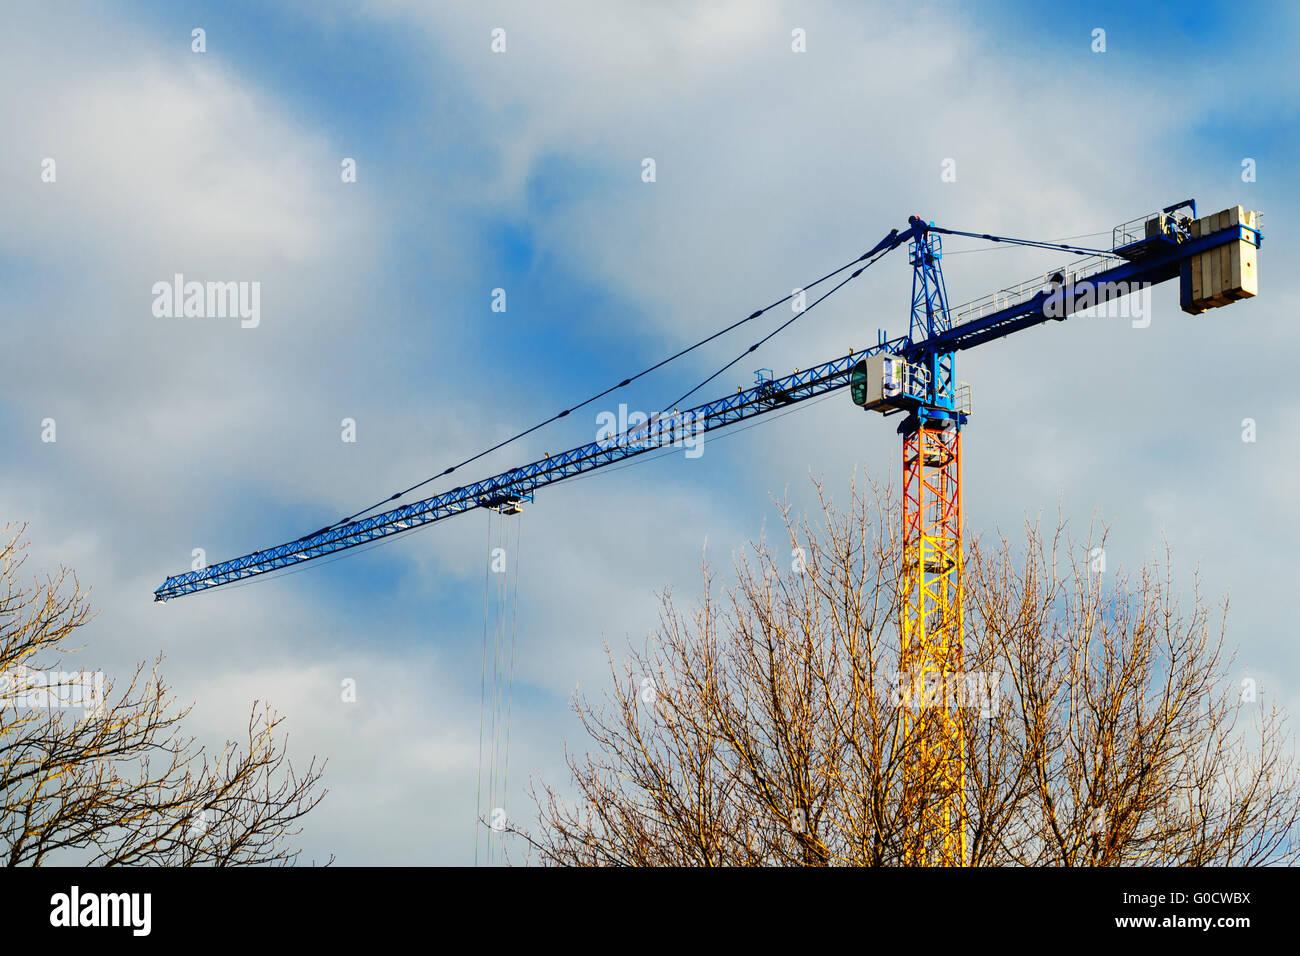 Construction crane - Stock Image